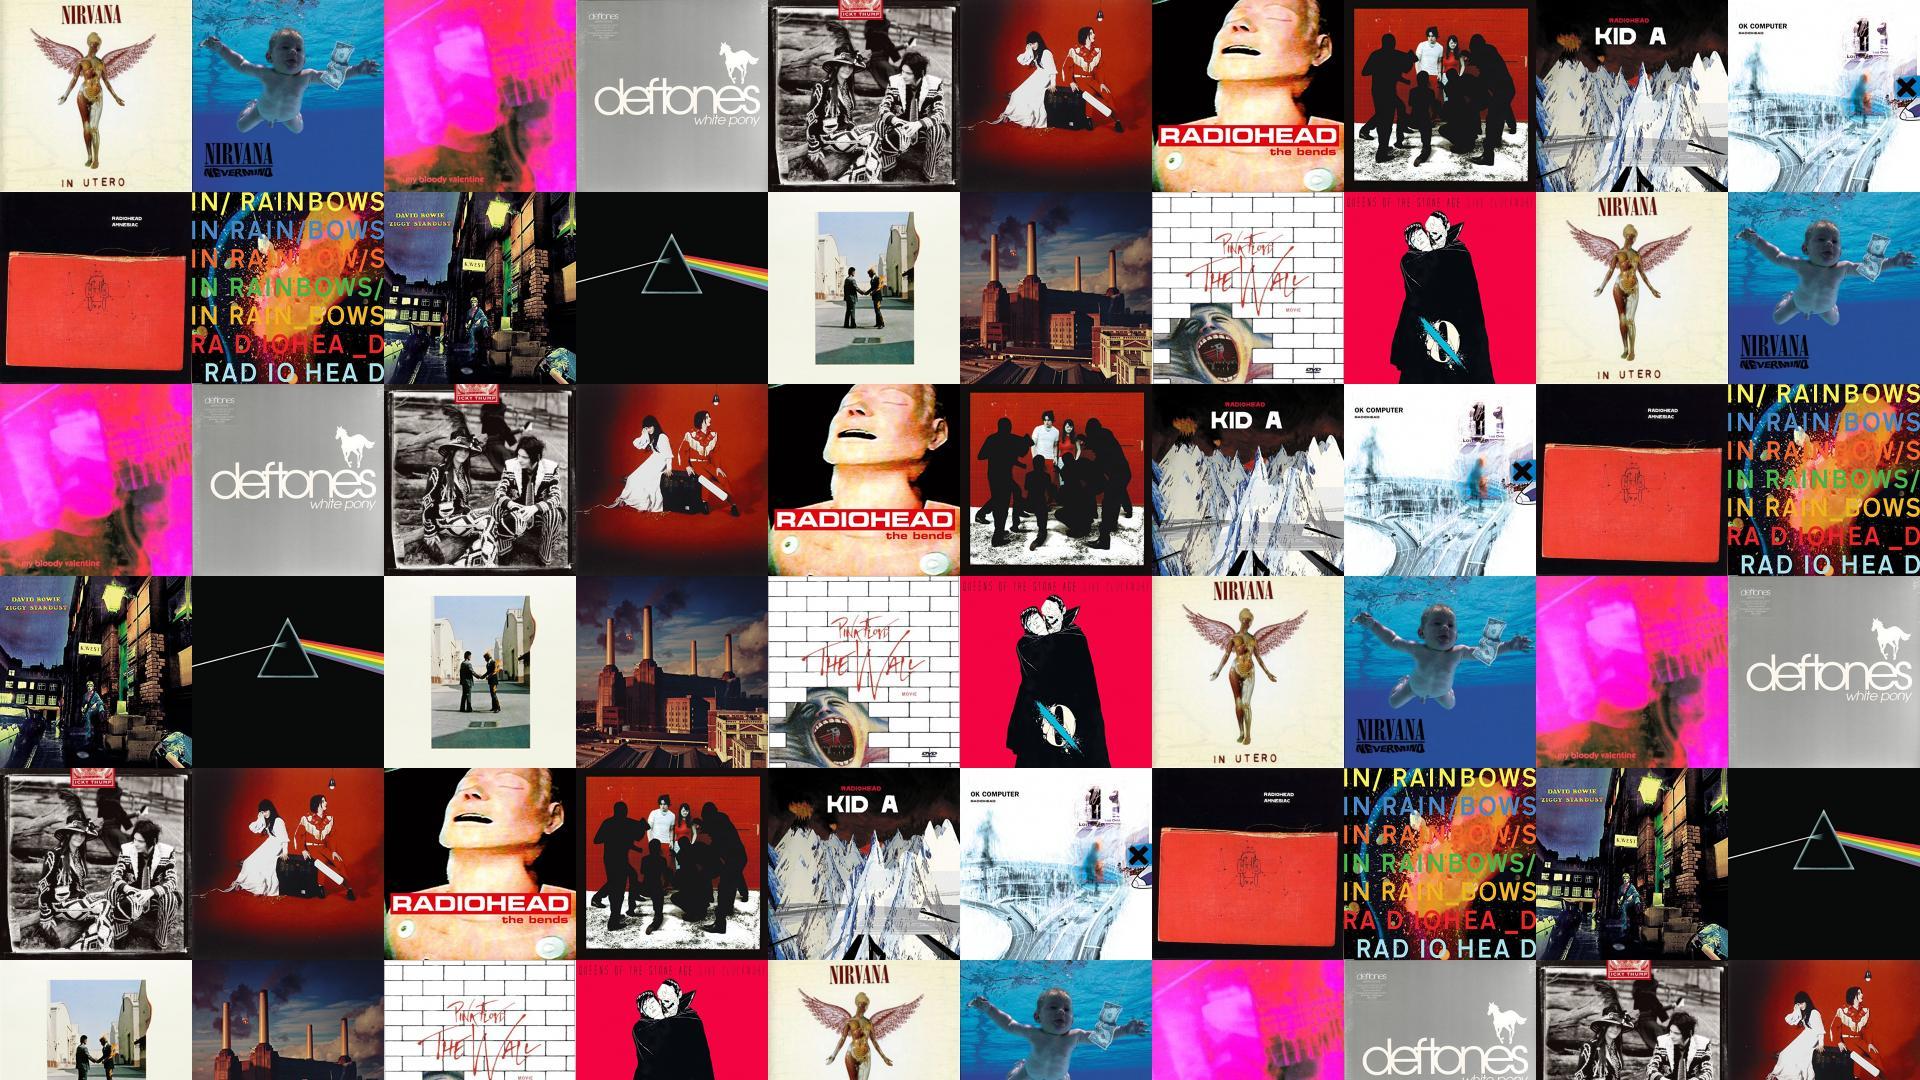 nirvana in utero full album download